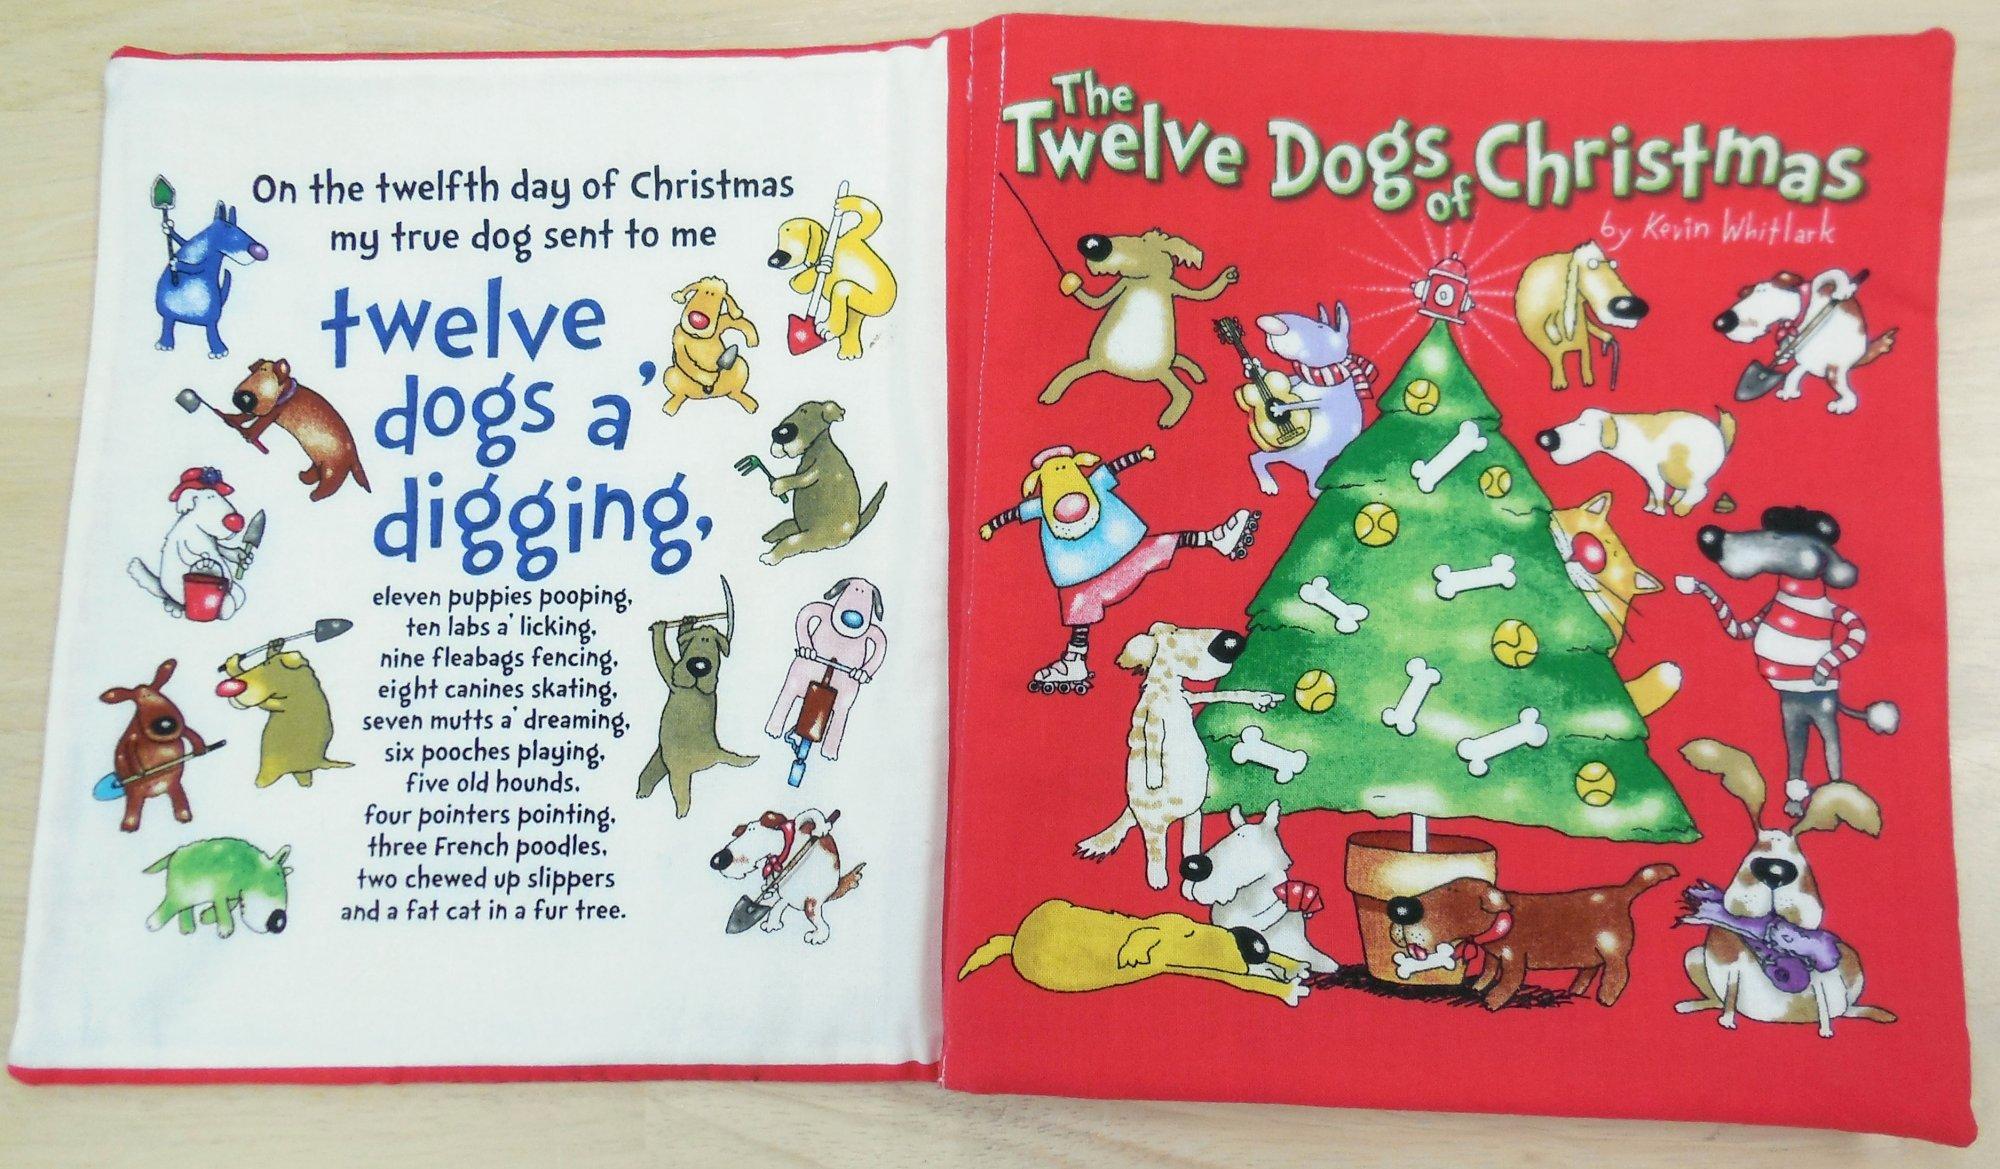 12 Dogs of Christmas - Book Panel